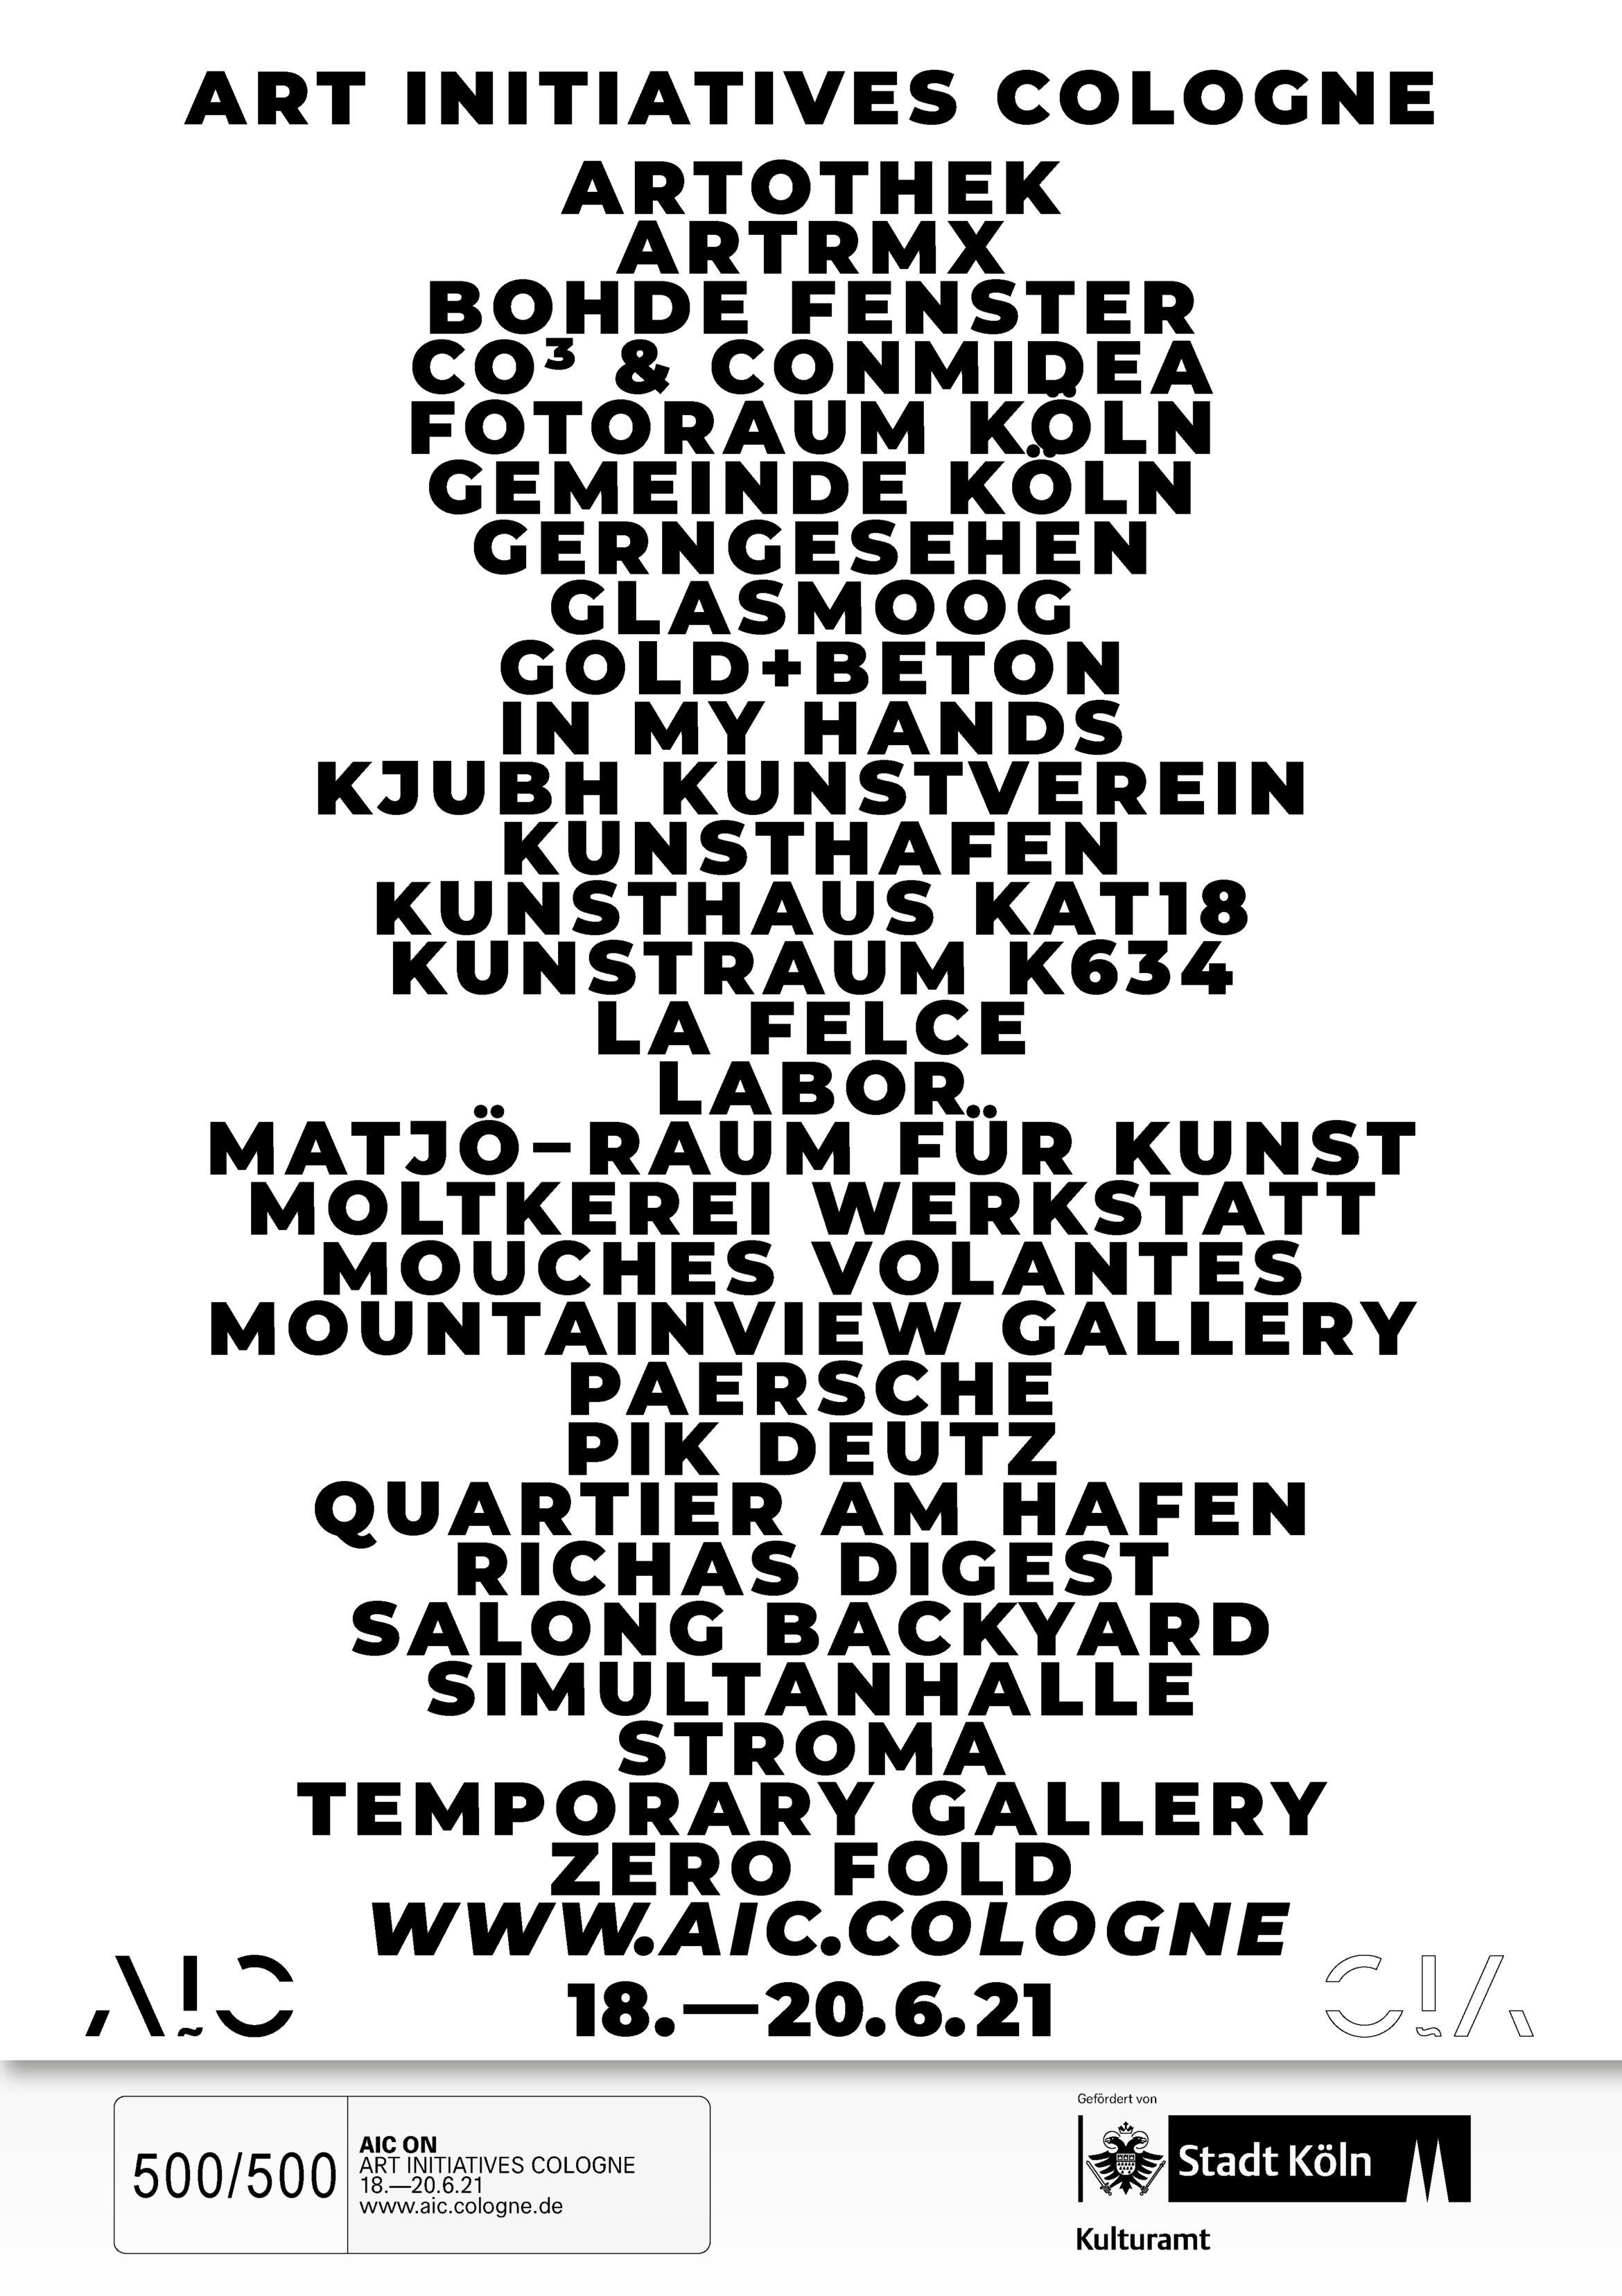 Indexplakat |AIC ON | Plakat |Typografie